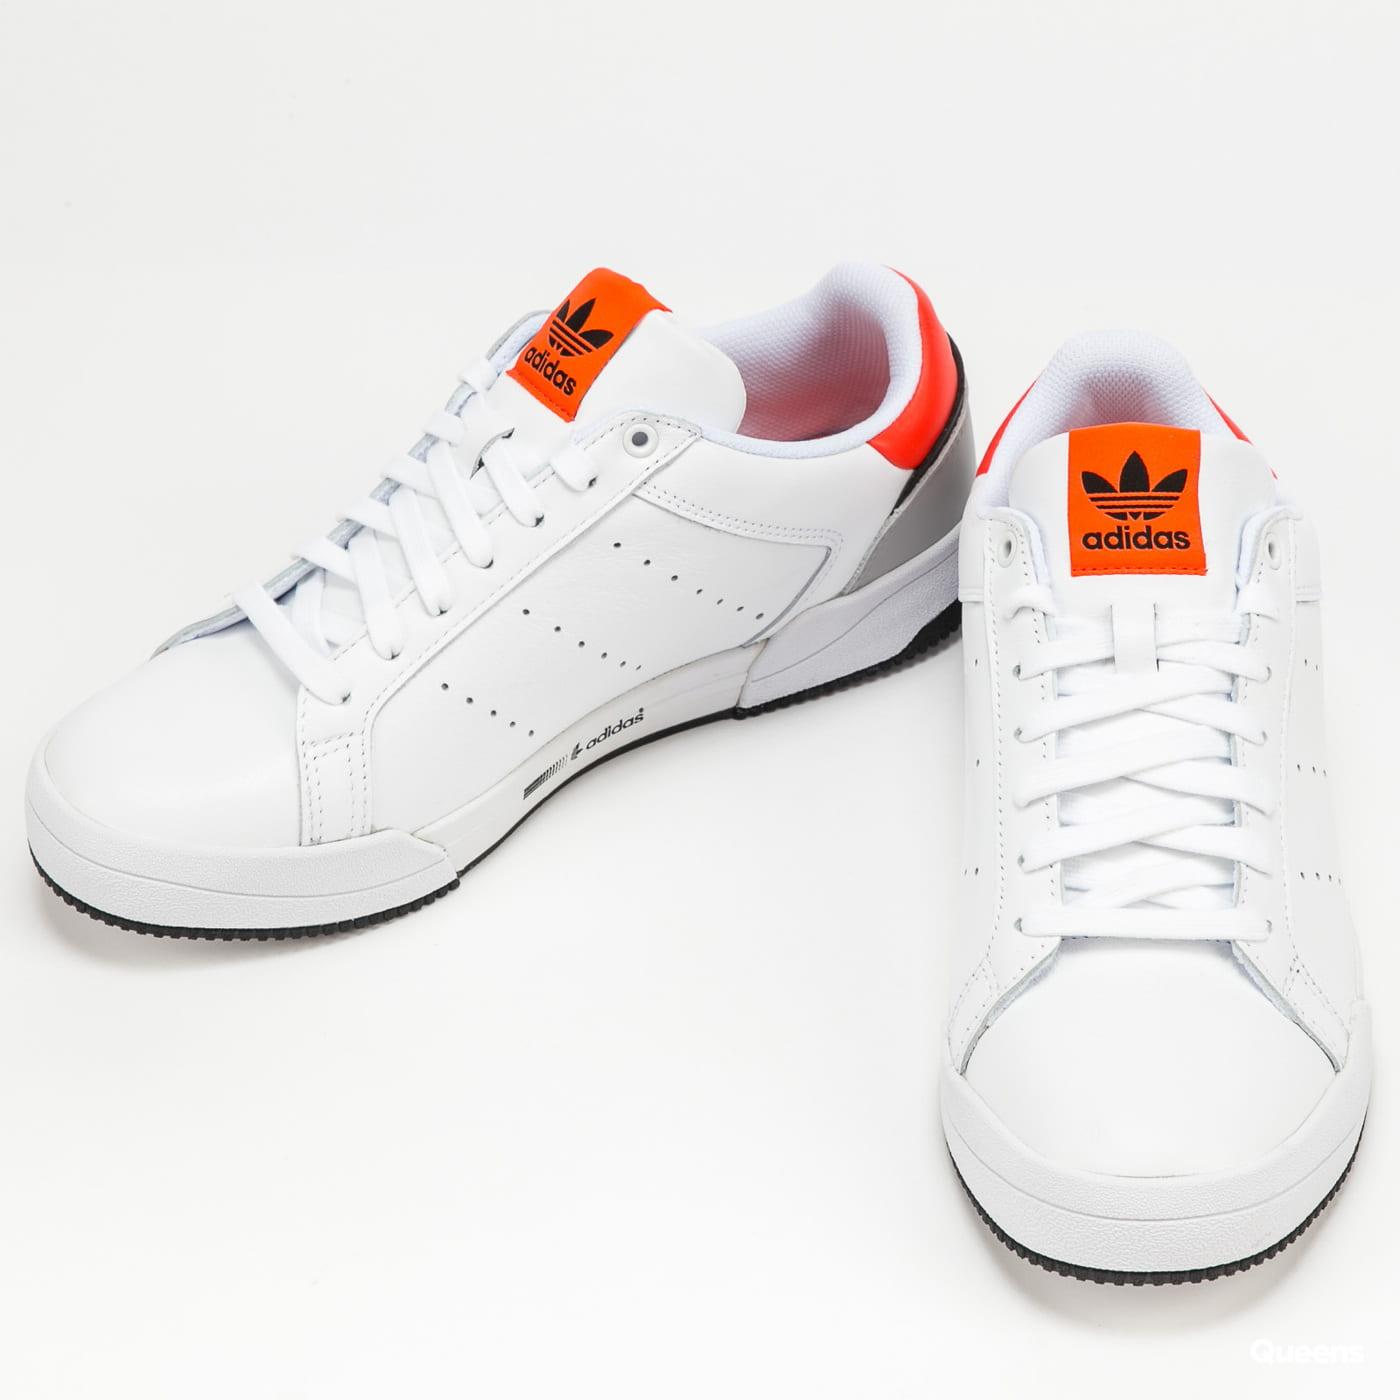 adidas Originals Court Tourino ftwwht / sesore / gretwo